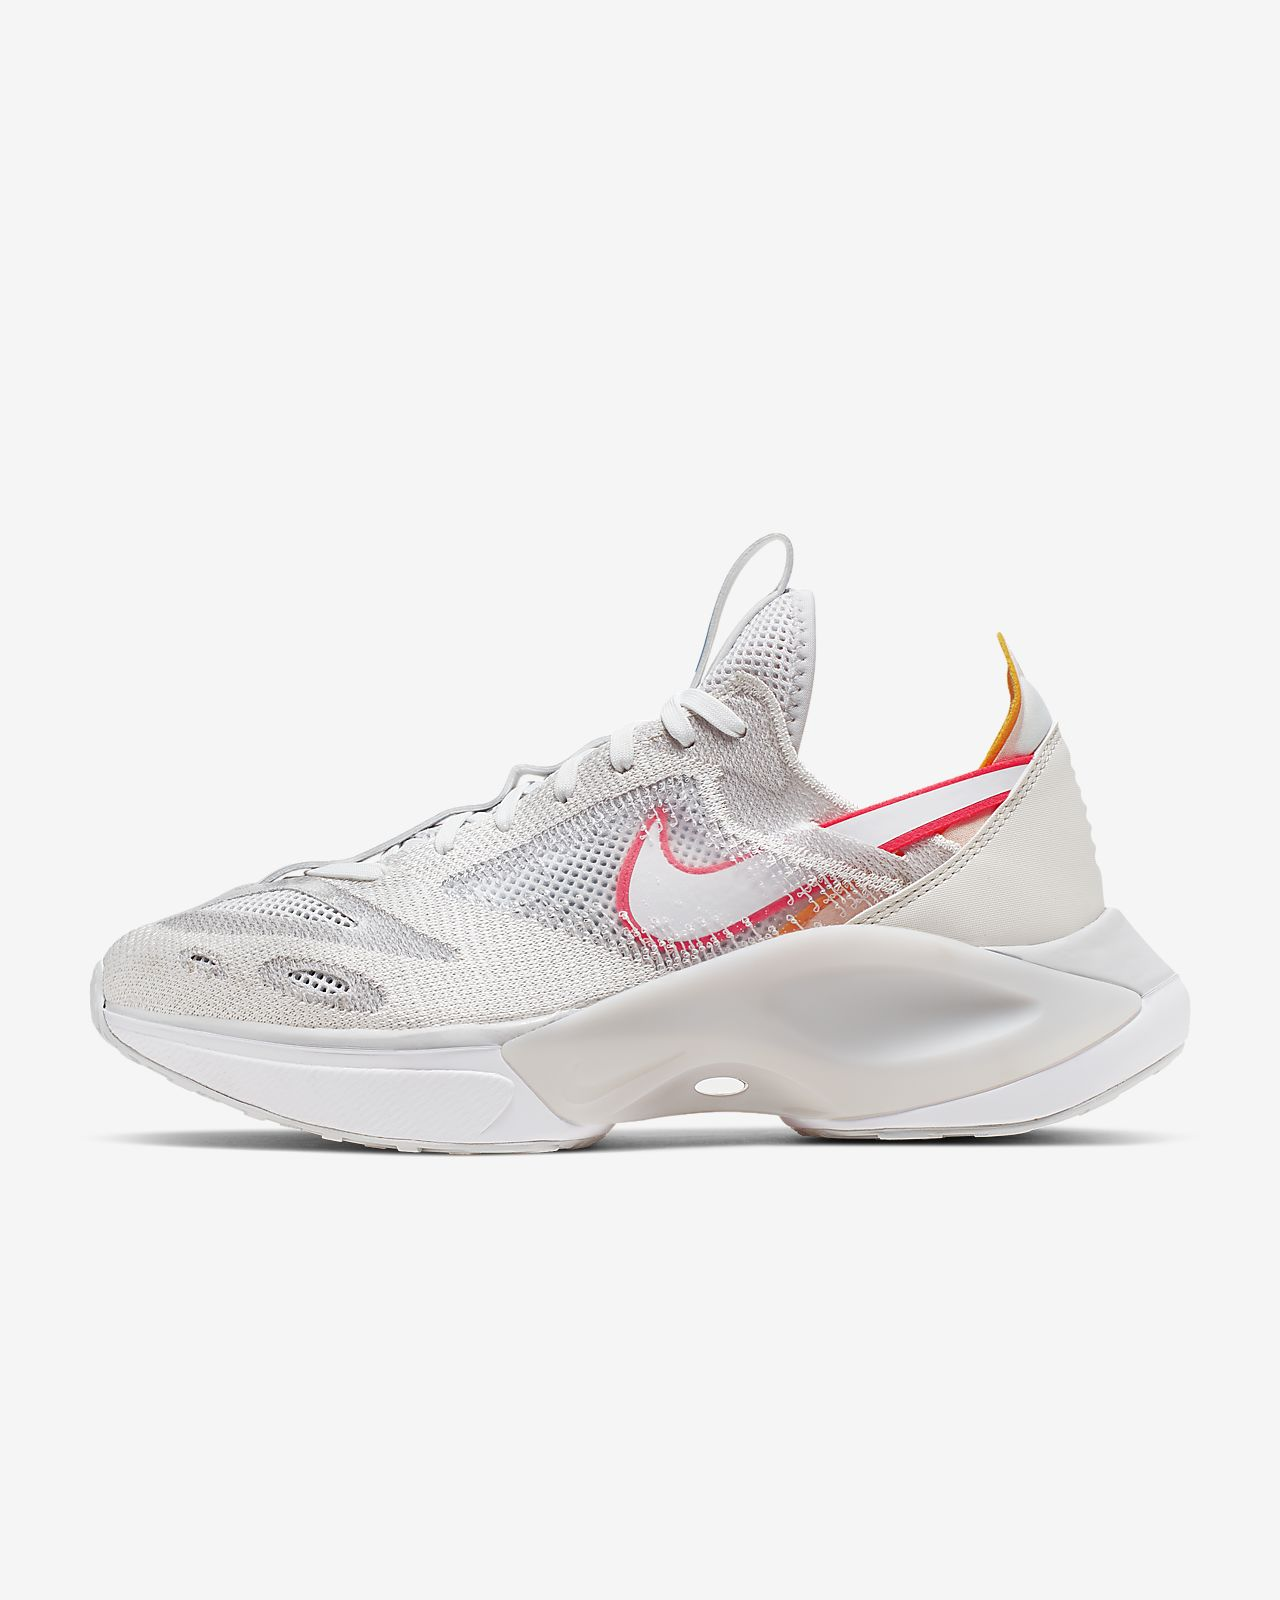 Sko Nike N110 D/MS/X för män